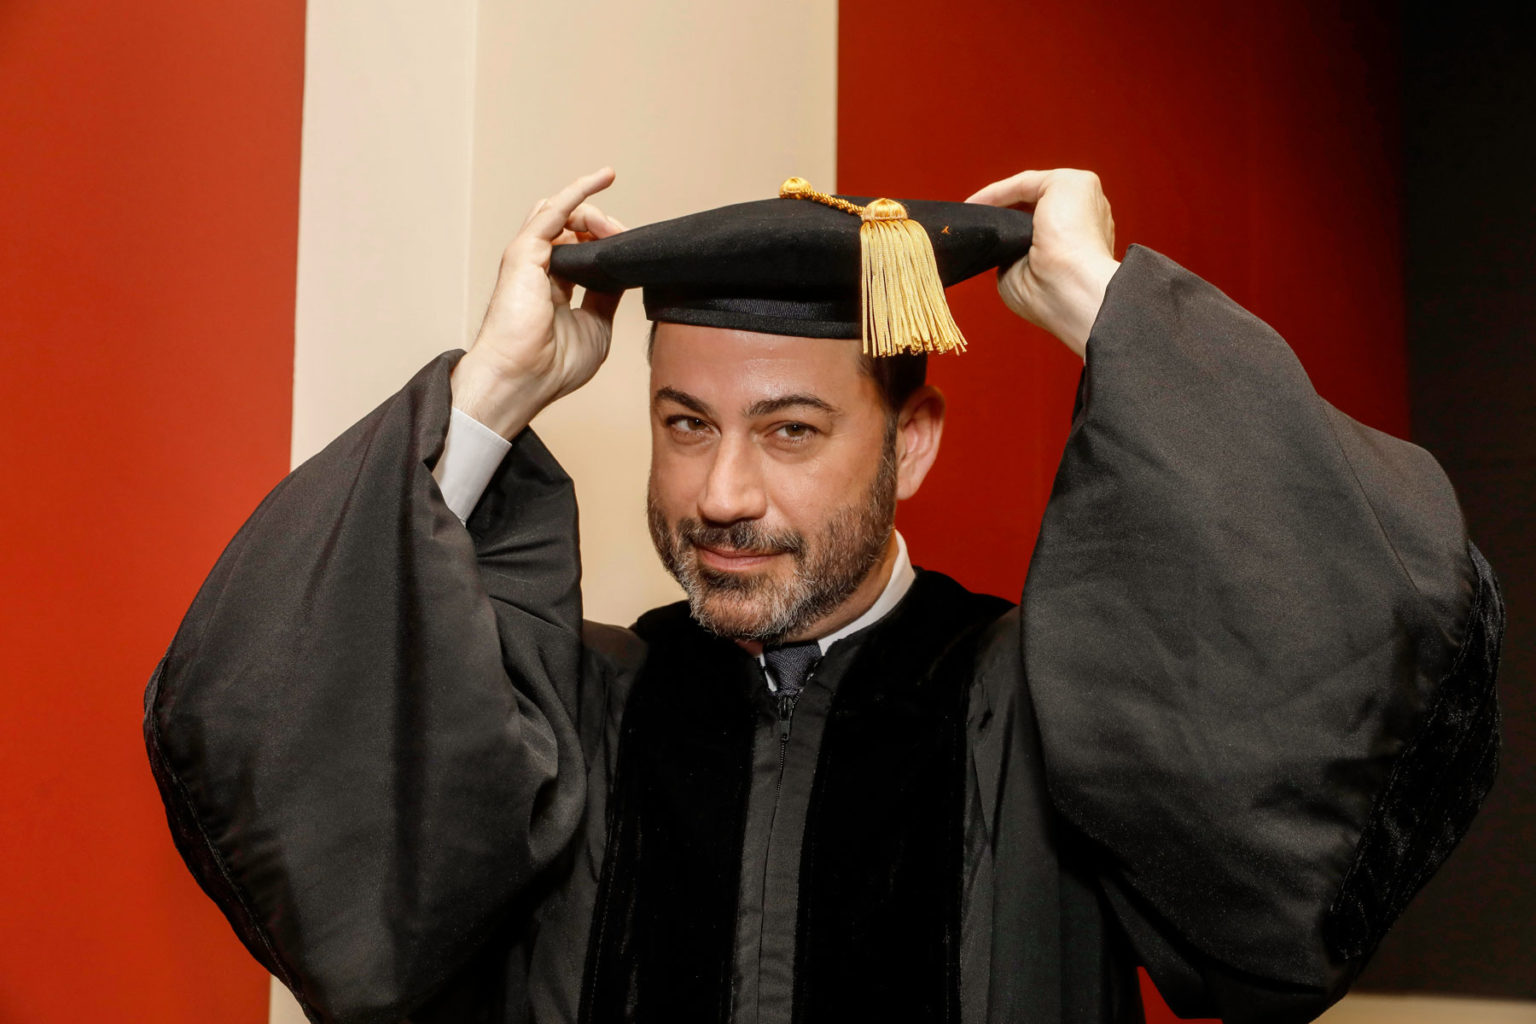 USC校园名人 Jimmy Kimmel -南加州大学中文官网